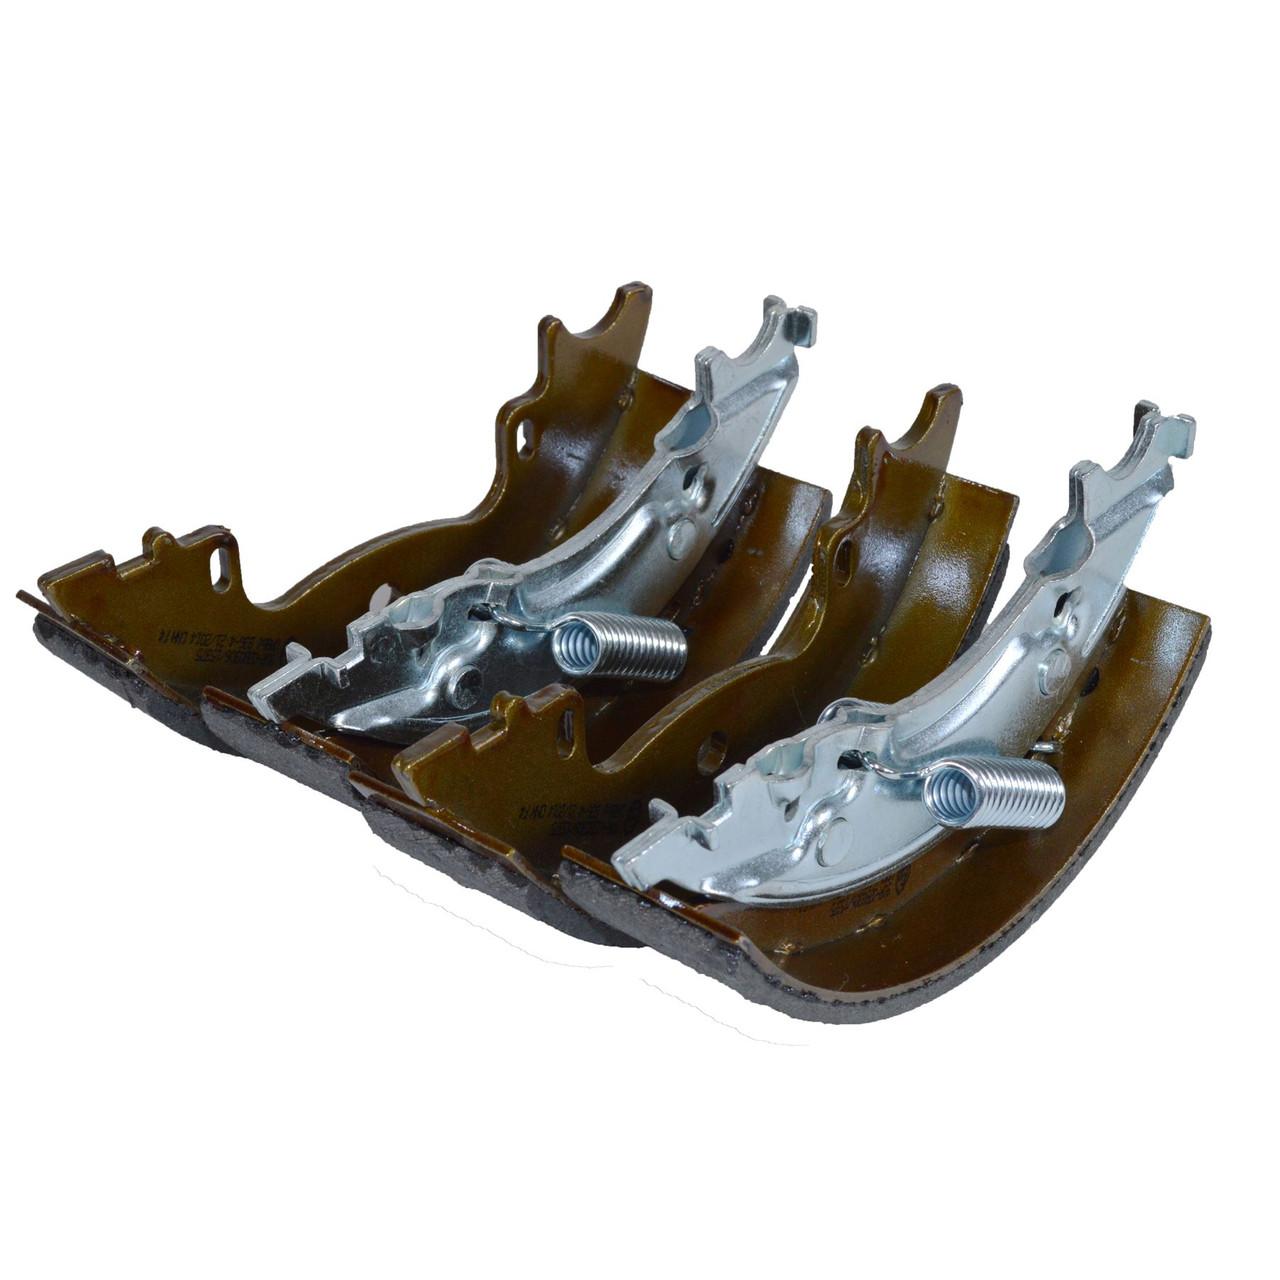 AB Tools Trailer Brake Adjuster Kit For Knott Trailers Brian James Shoe Size 200mm x 50mm